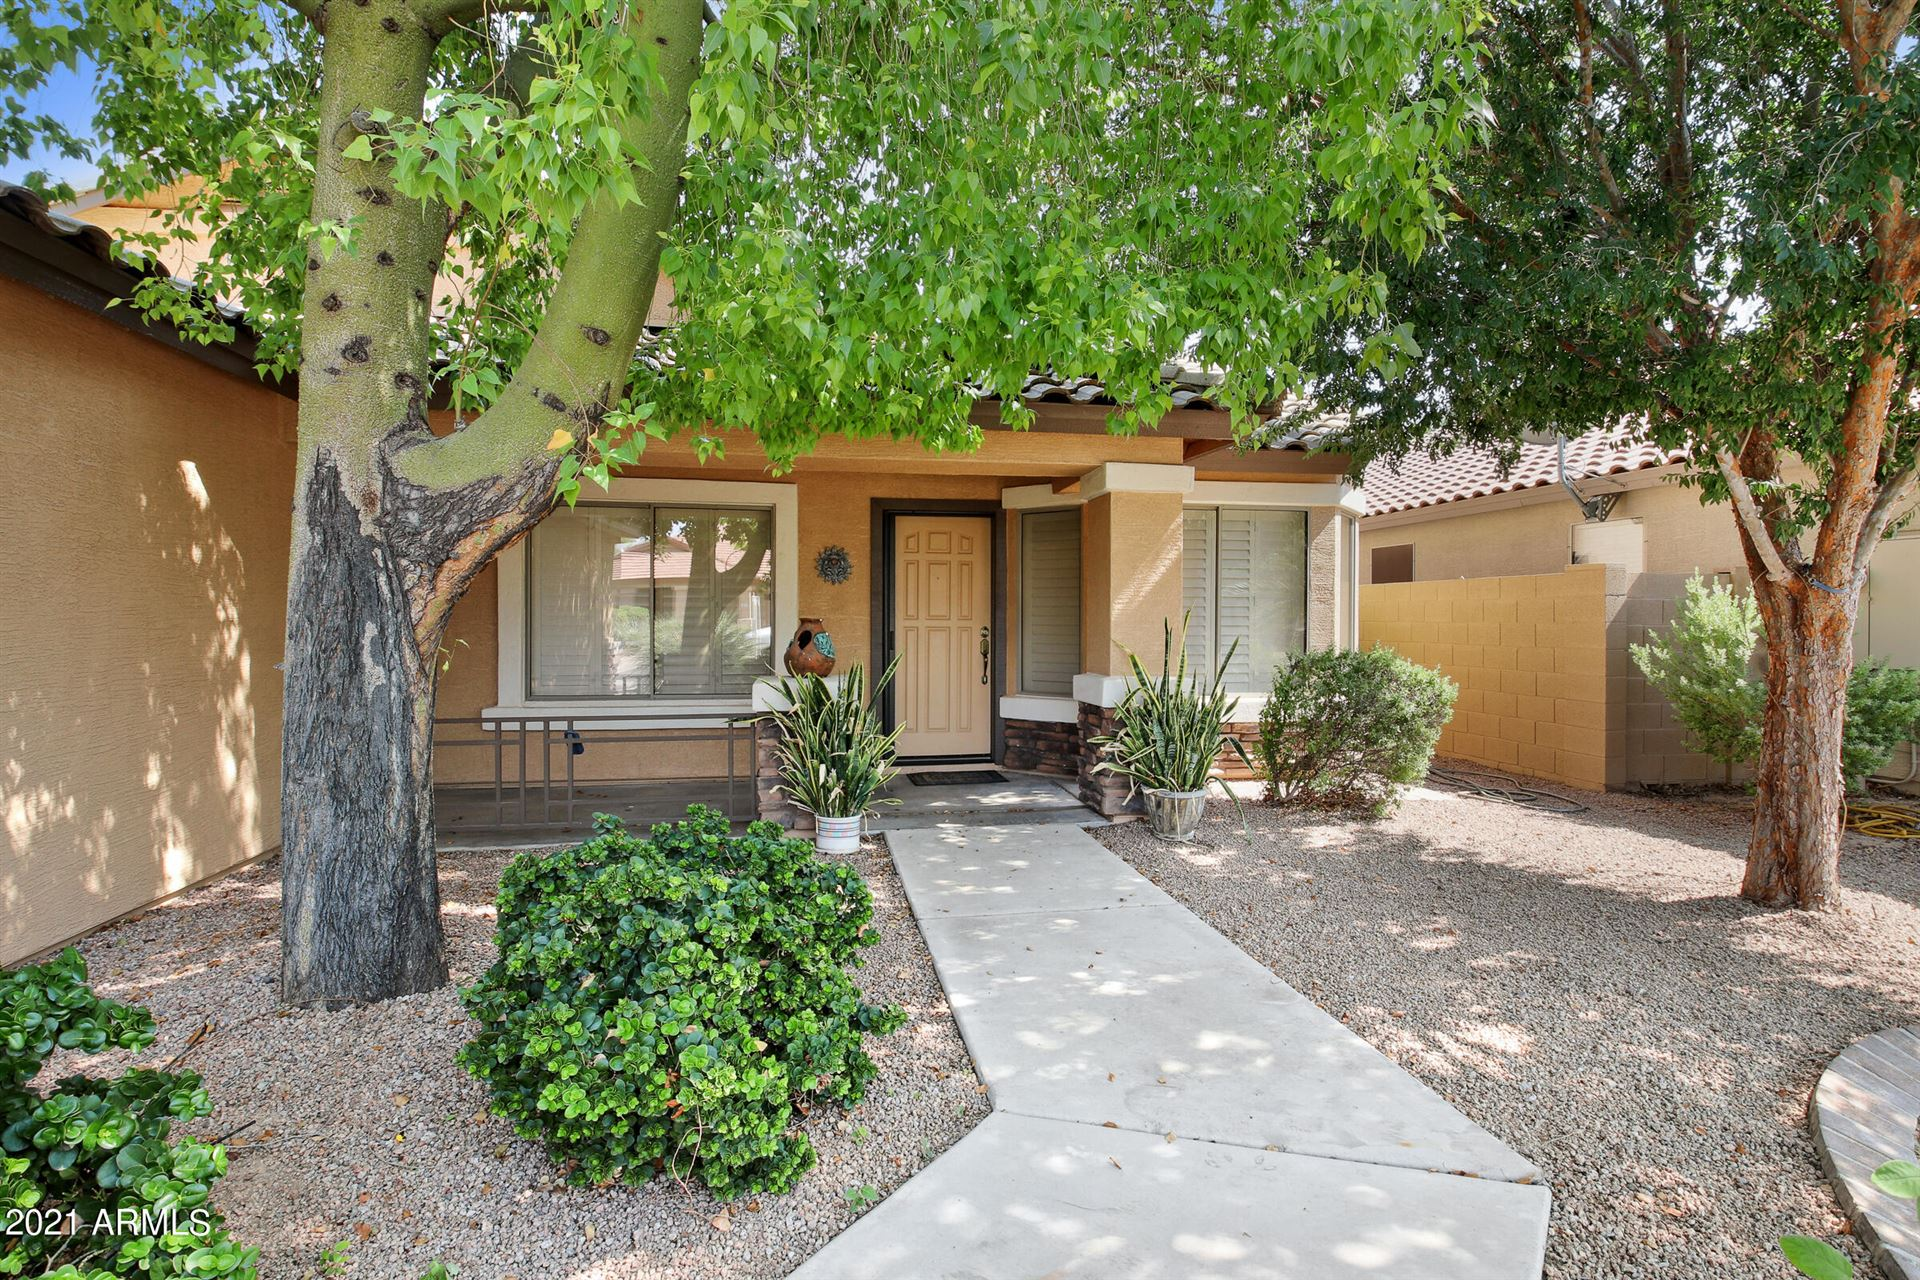 Photo of 209 E CLAIRIDGE Drive, San Tan Valley, AZ 85143 (MLS # 6295361)